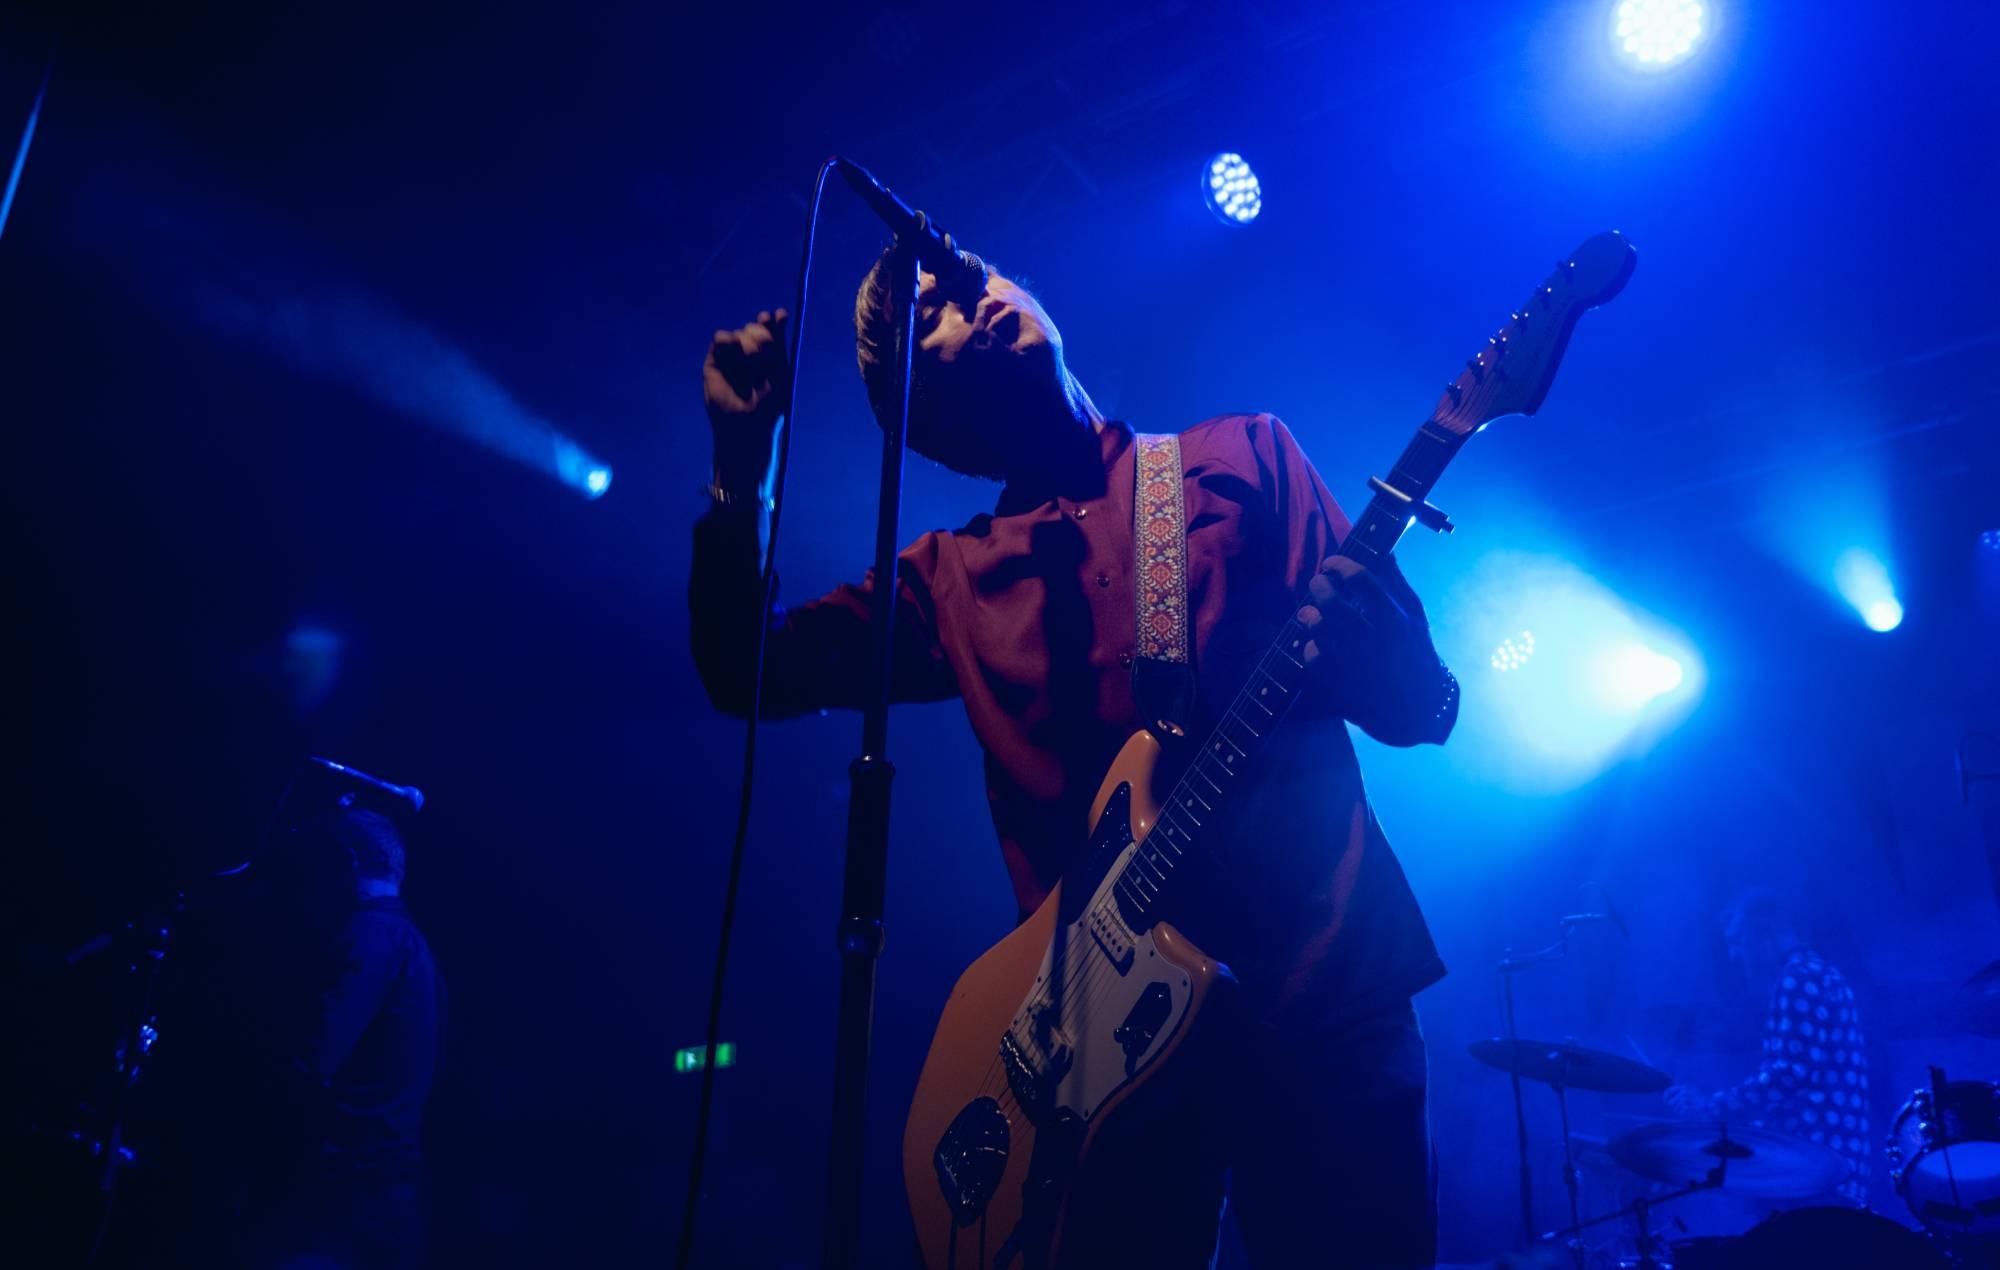 Johnny Marr live at Camden Electric Ballroom. Credit: Riaz Gomez